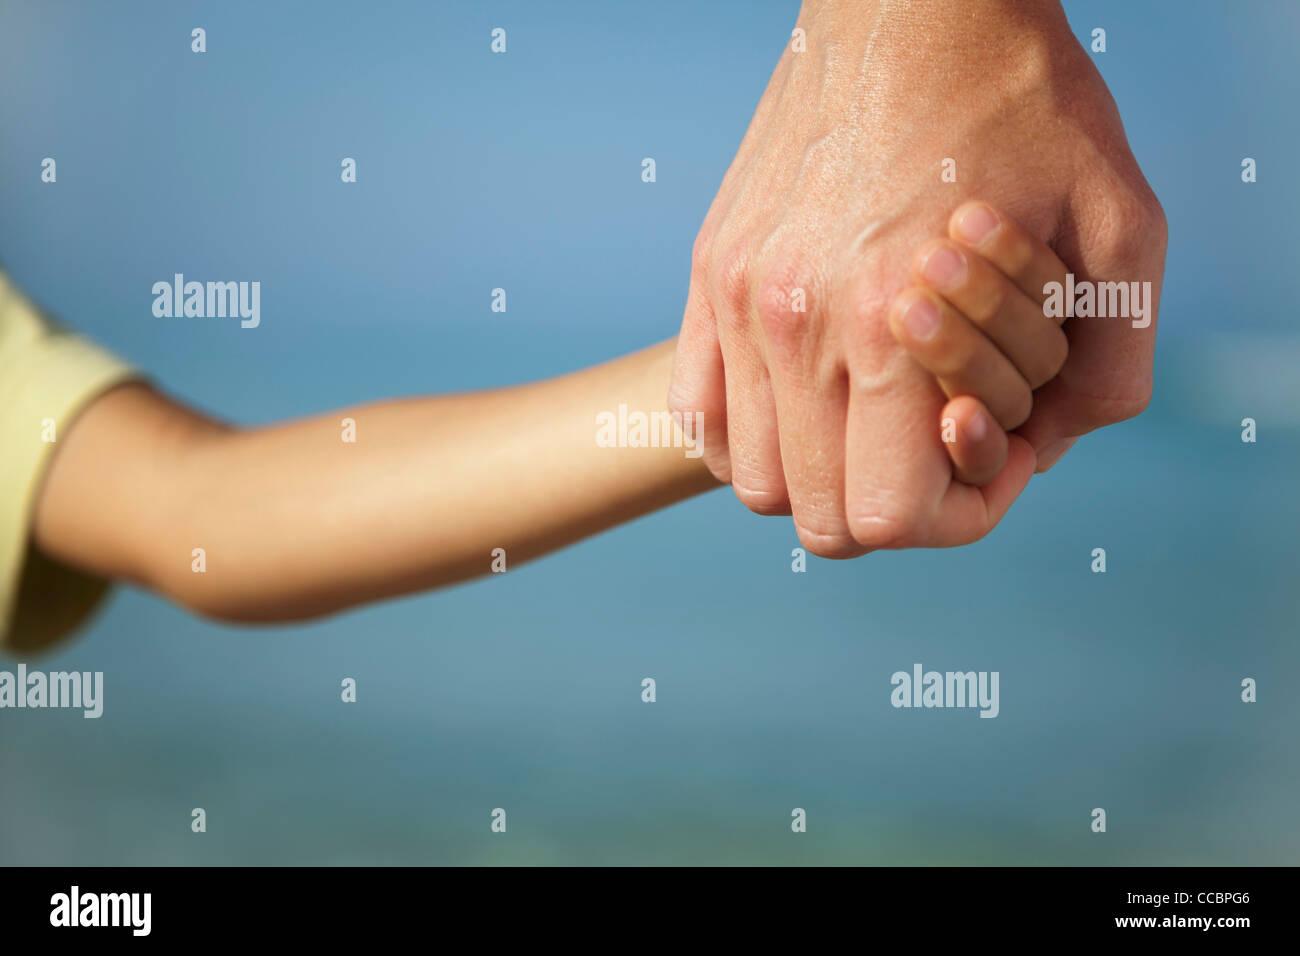 Erwachsenen Kindes Hand hält, beschnitten Stockbild